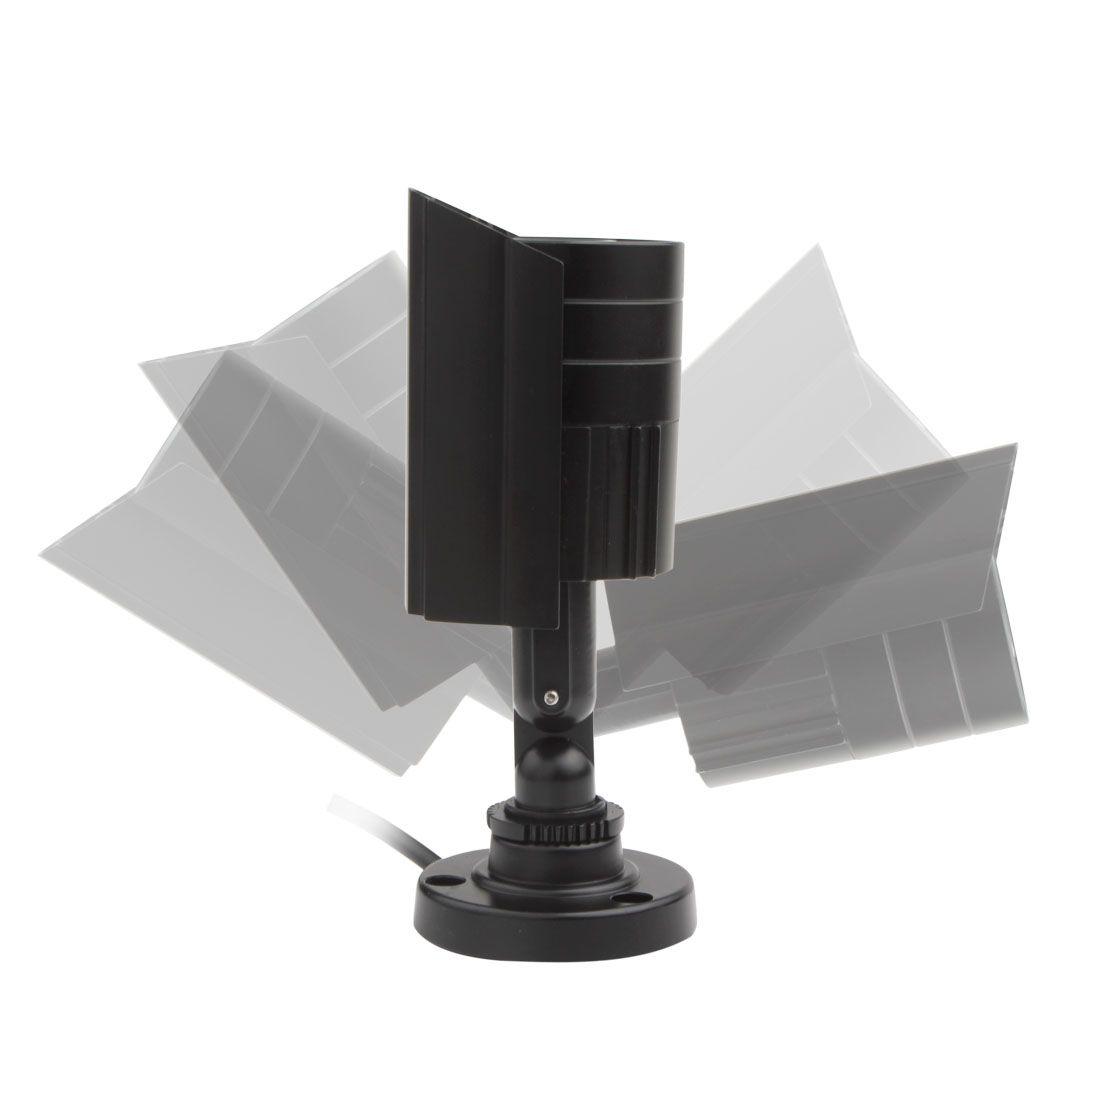 1000TVL 6mm Lens 1/3 CMOS Telecamera di sicurezza CCTV esterna IR Night Vision a colori impermeabile CCT_154